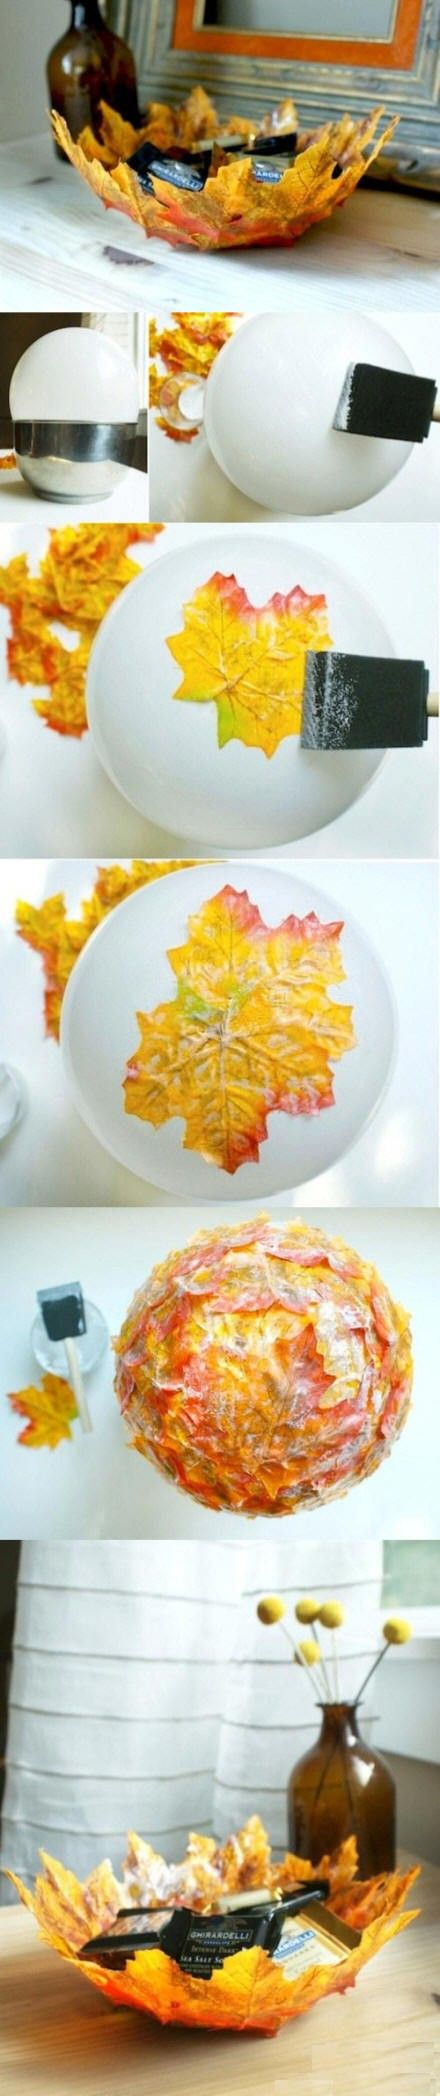 Cute idea for a fall centerpiece